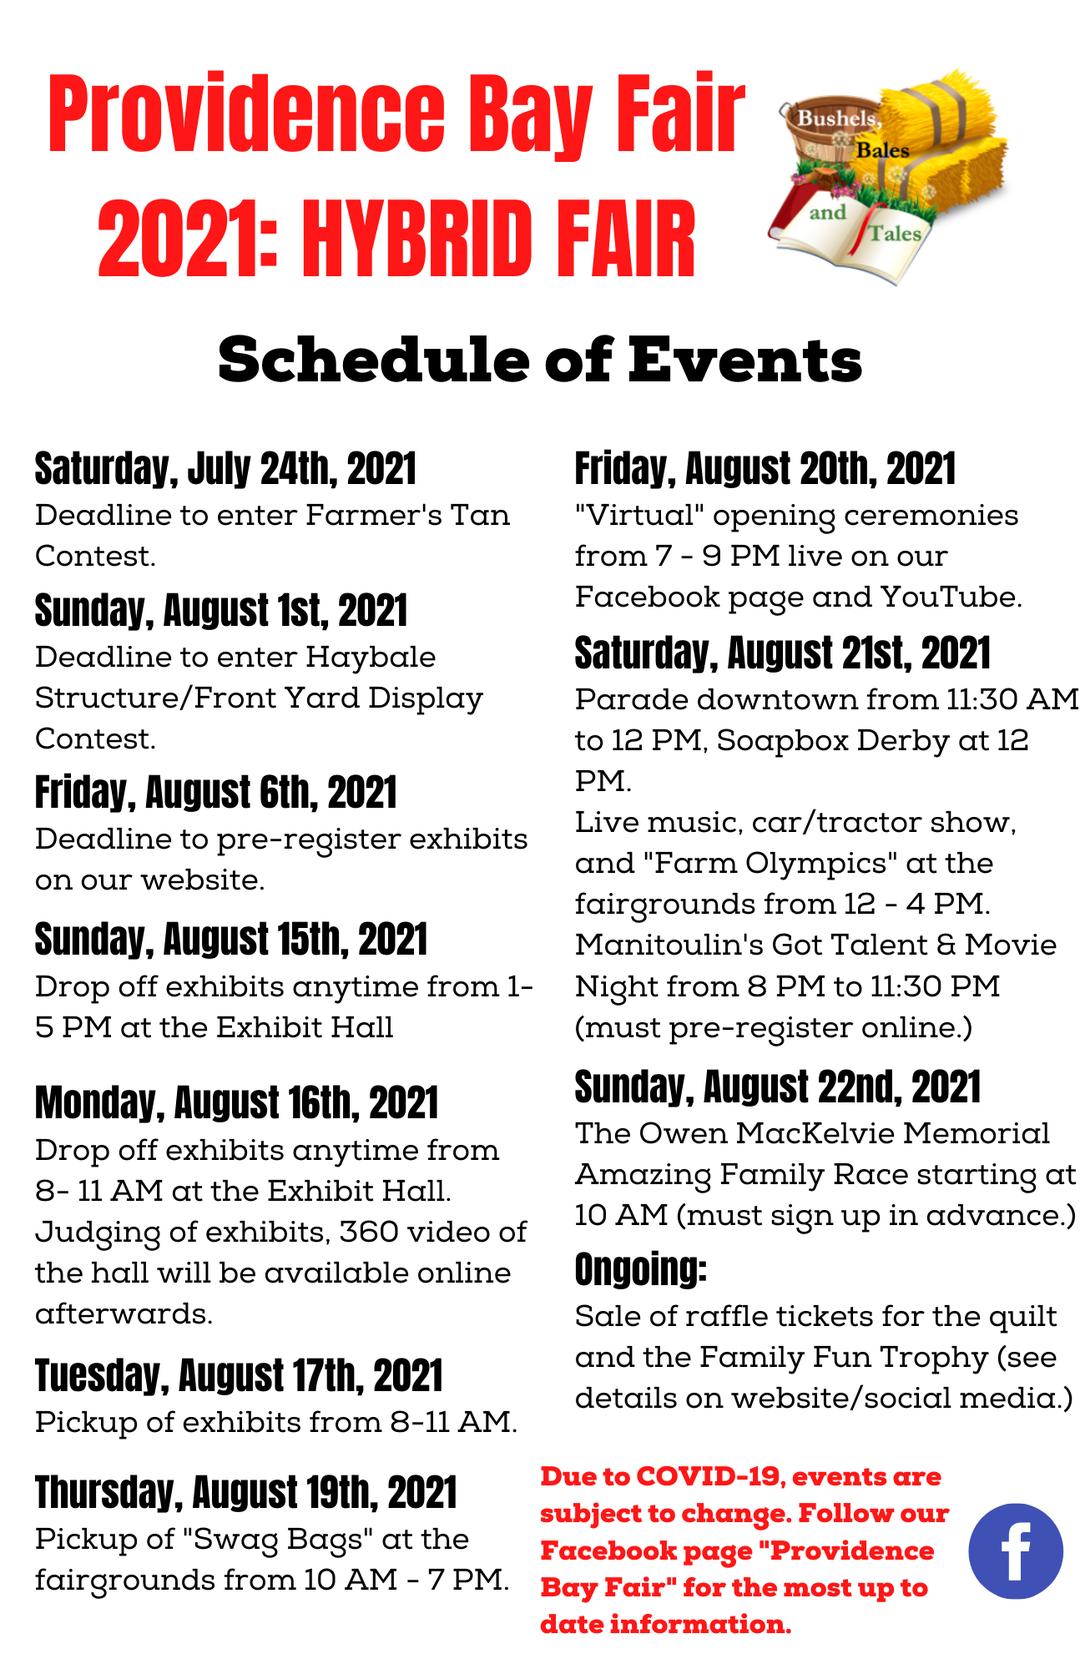 2021 Schedule of Events